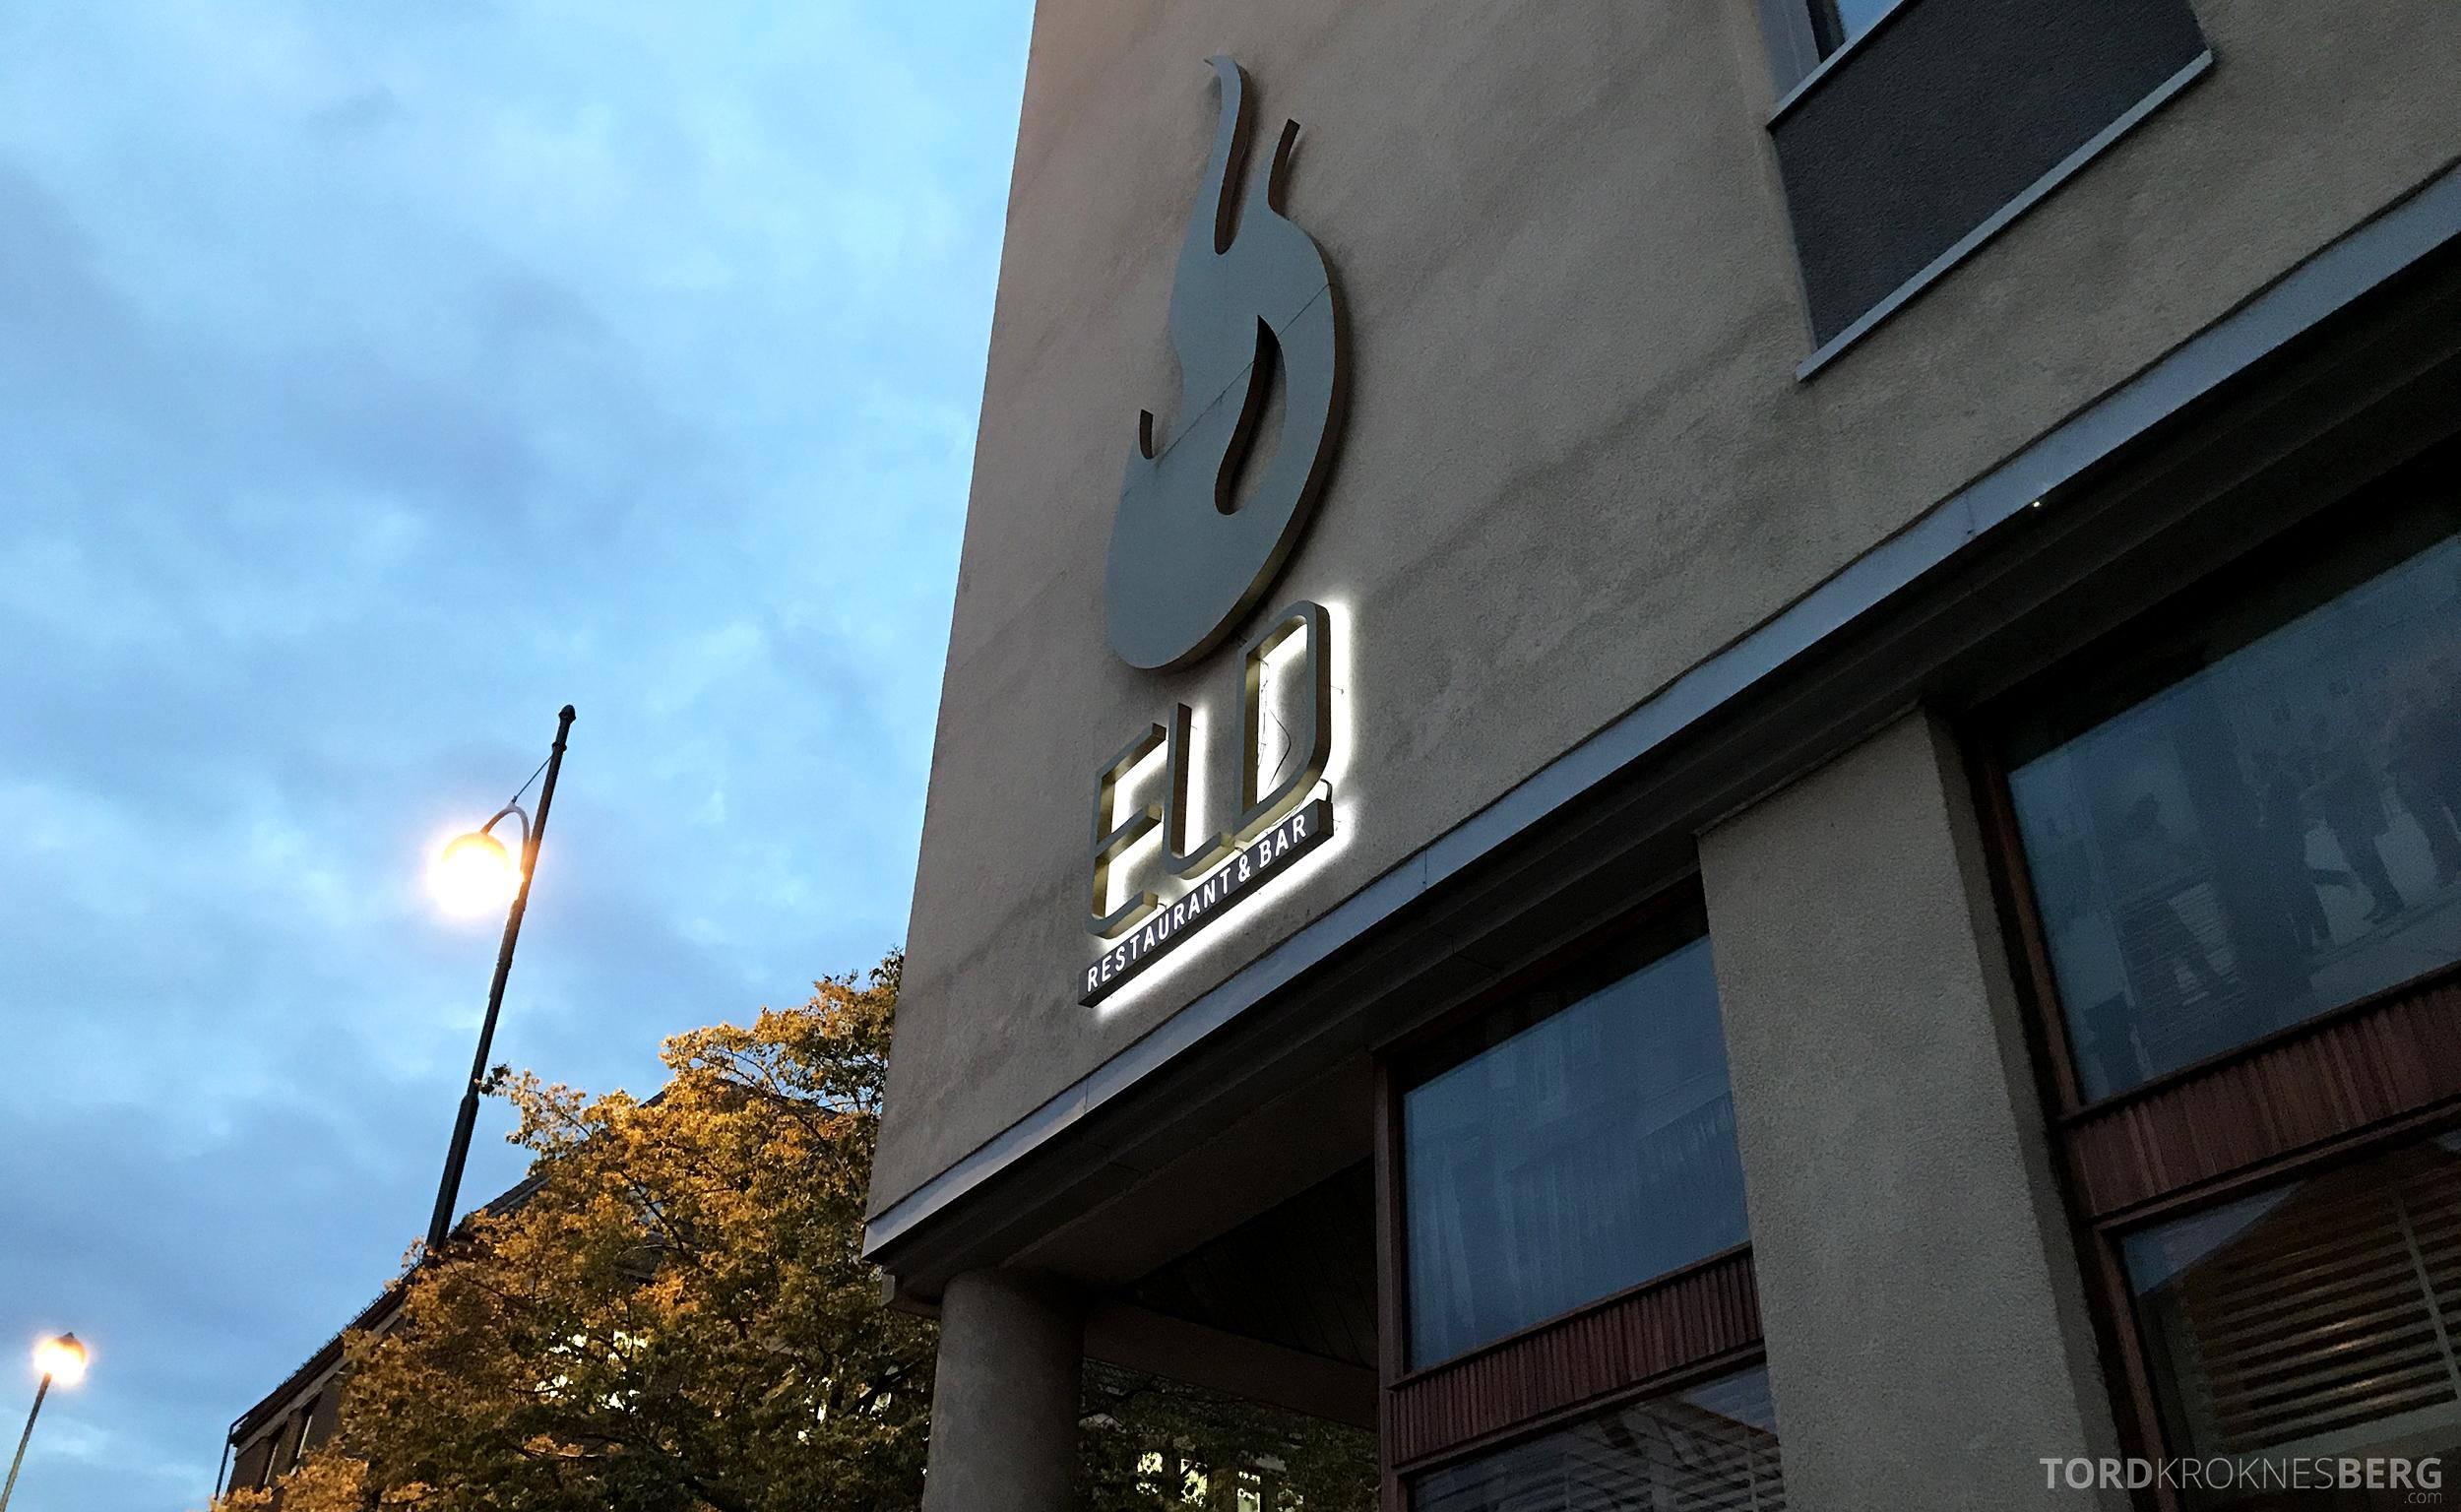 Emilies Eld Restaurant Trondheim logo